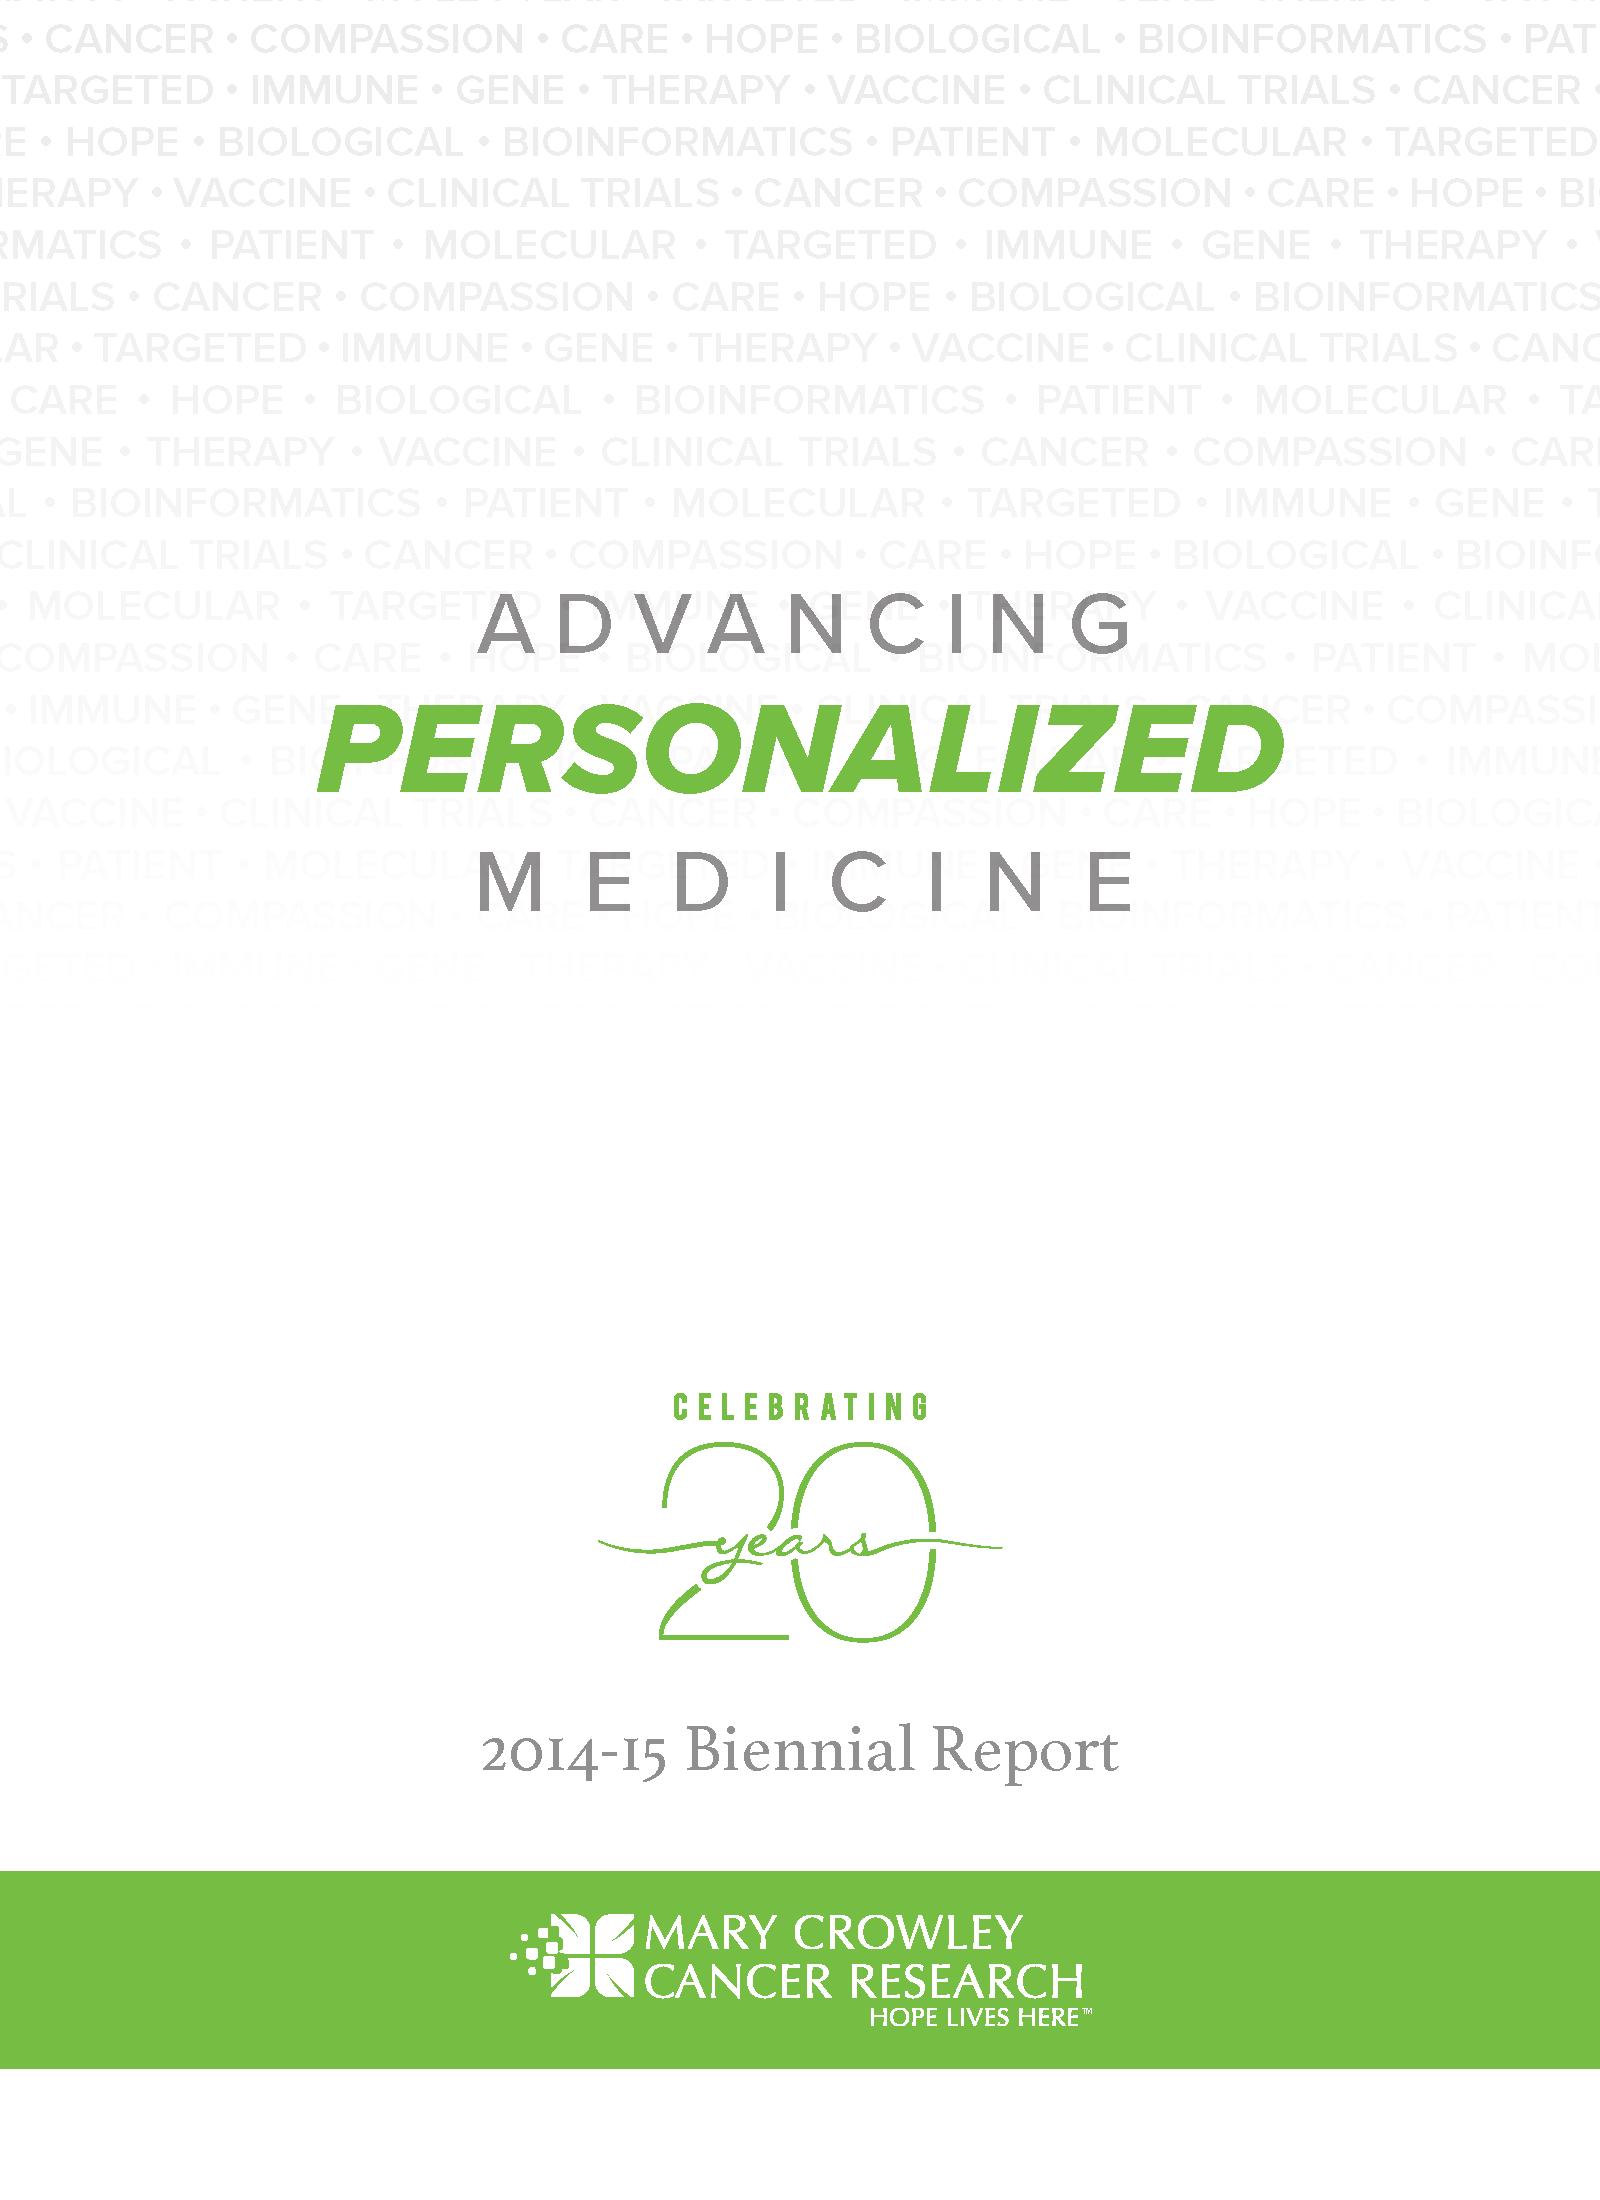 2014-2015 Biennial Report